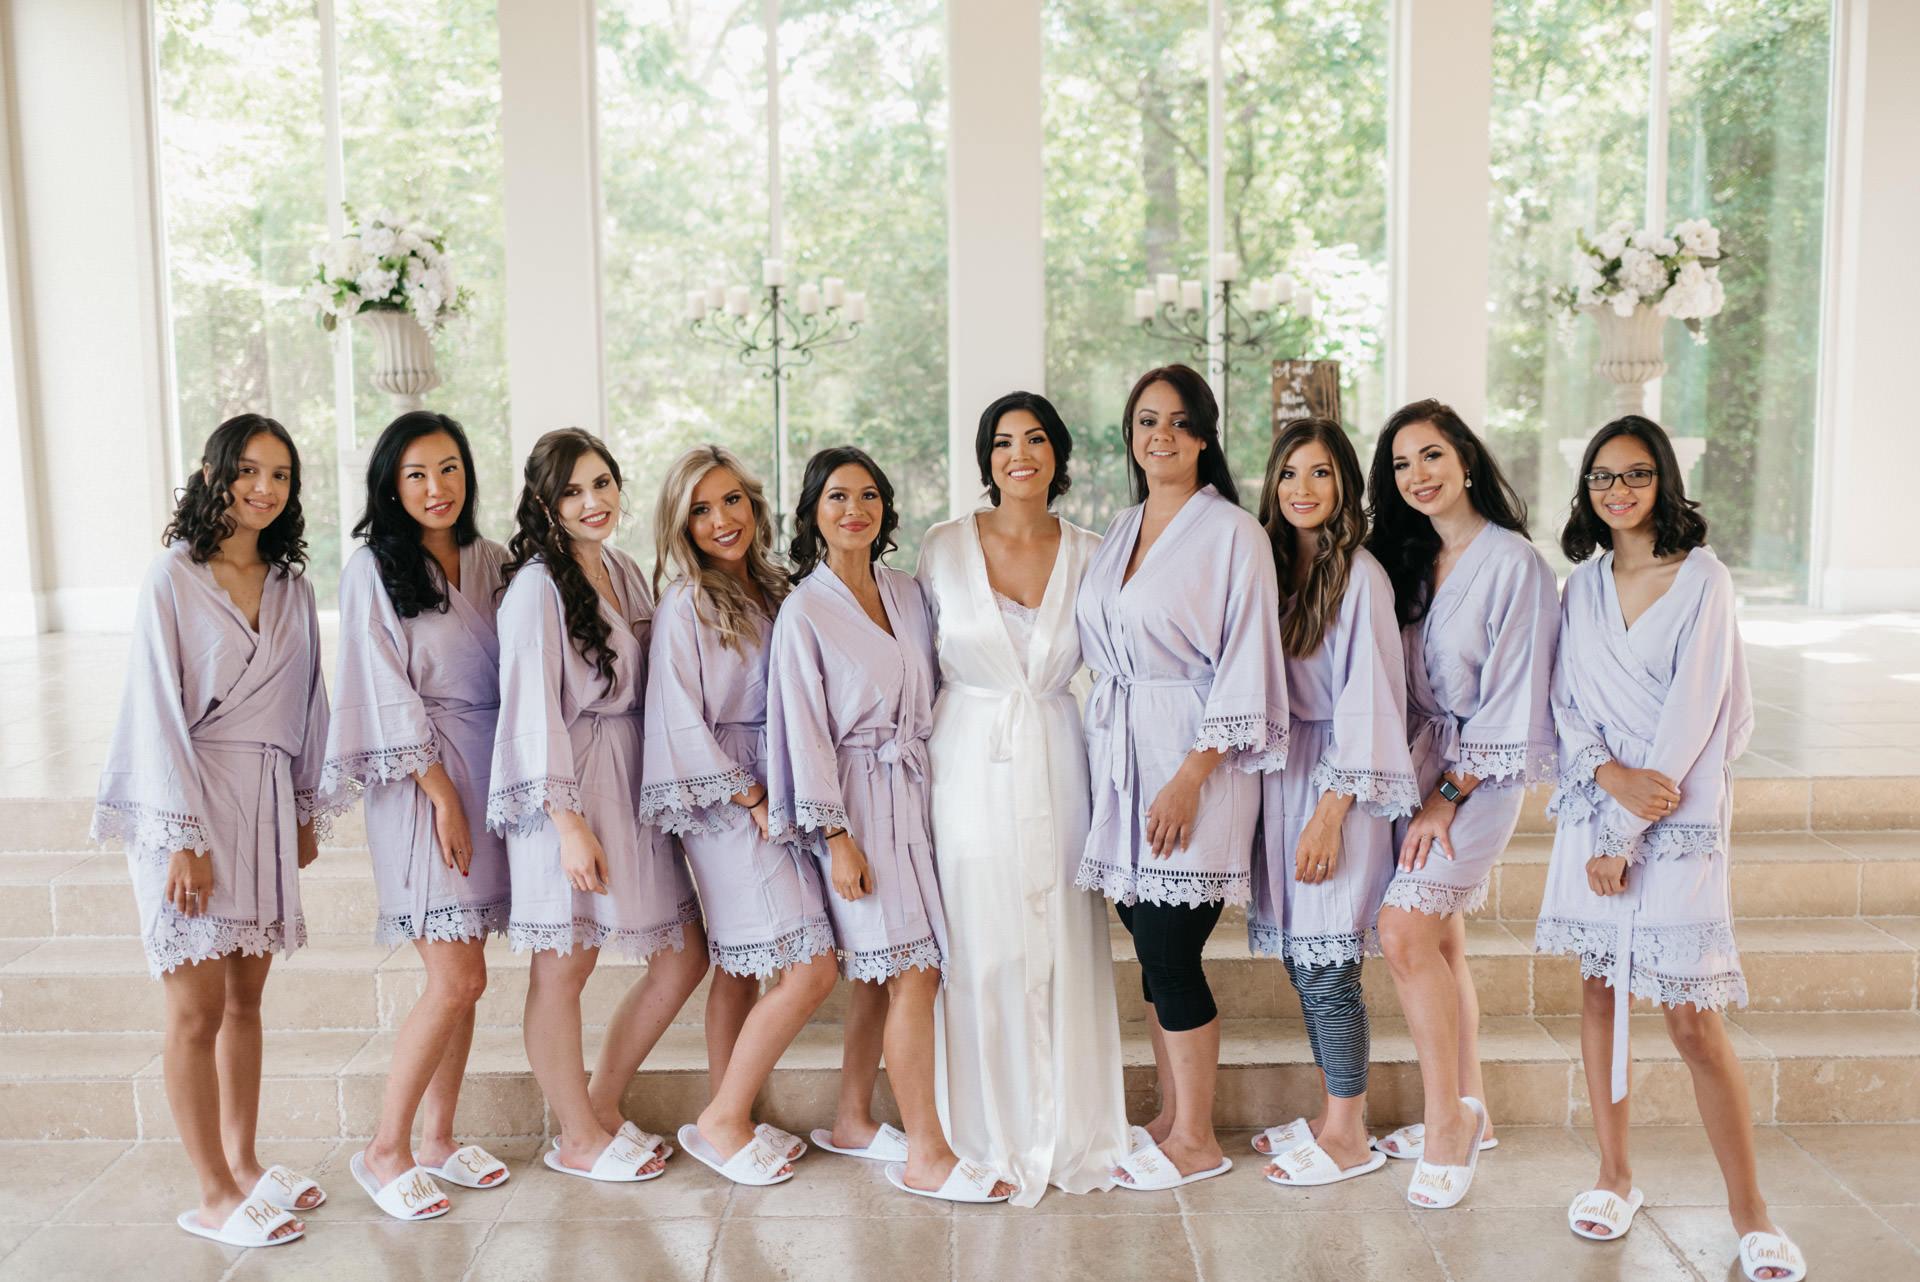 lexi-michael-wedding-blog-sm-20.jpg